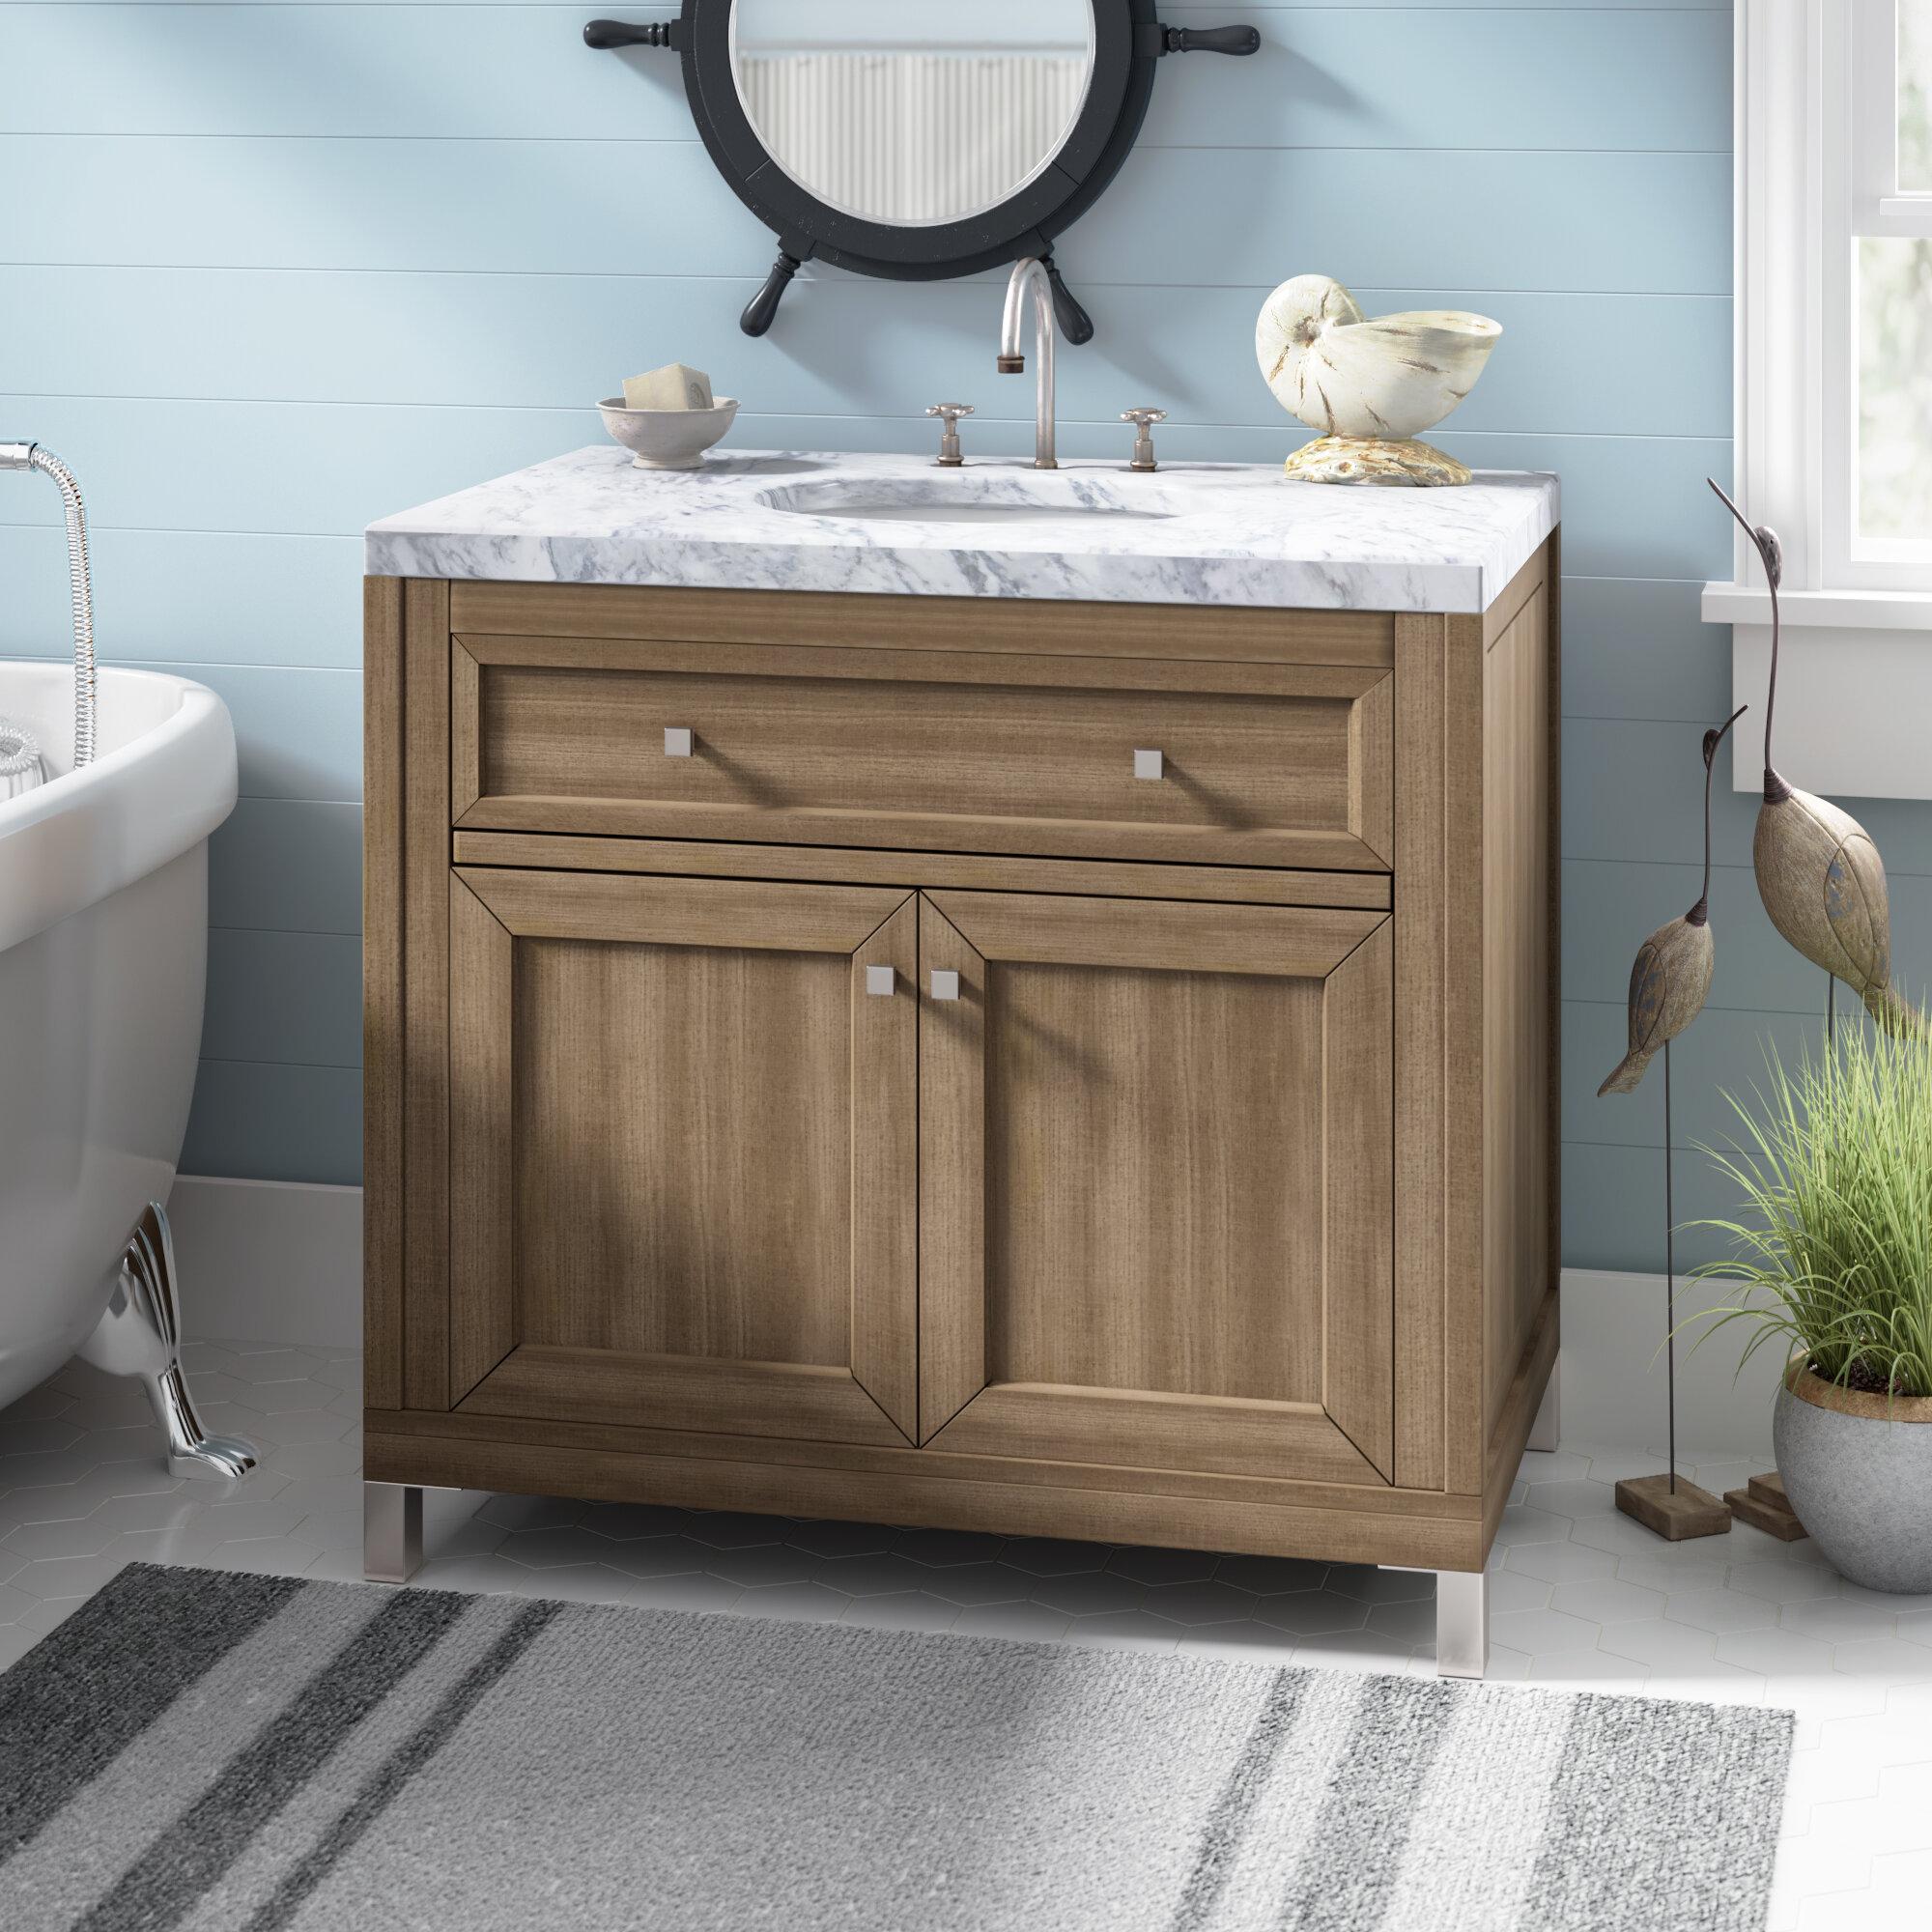 Picture of: Brayden Studio Whitworth 36 Wall Mounted Single Bathroom Vanity Set